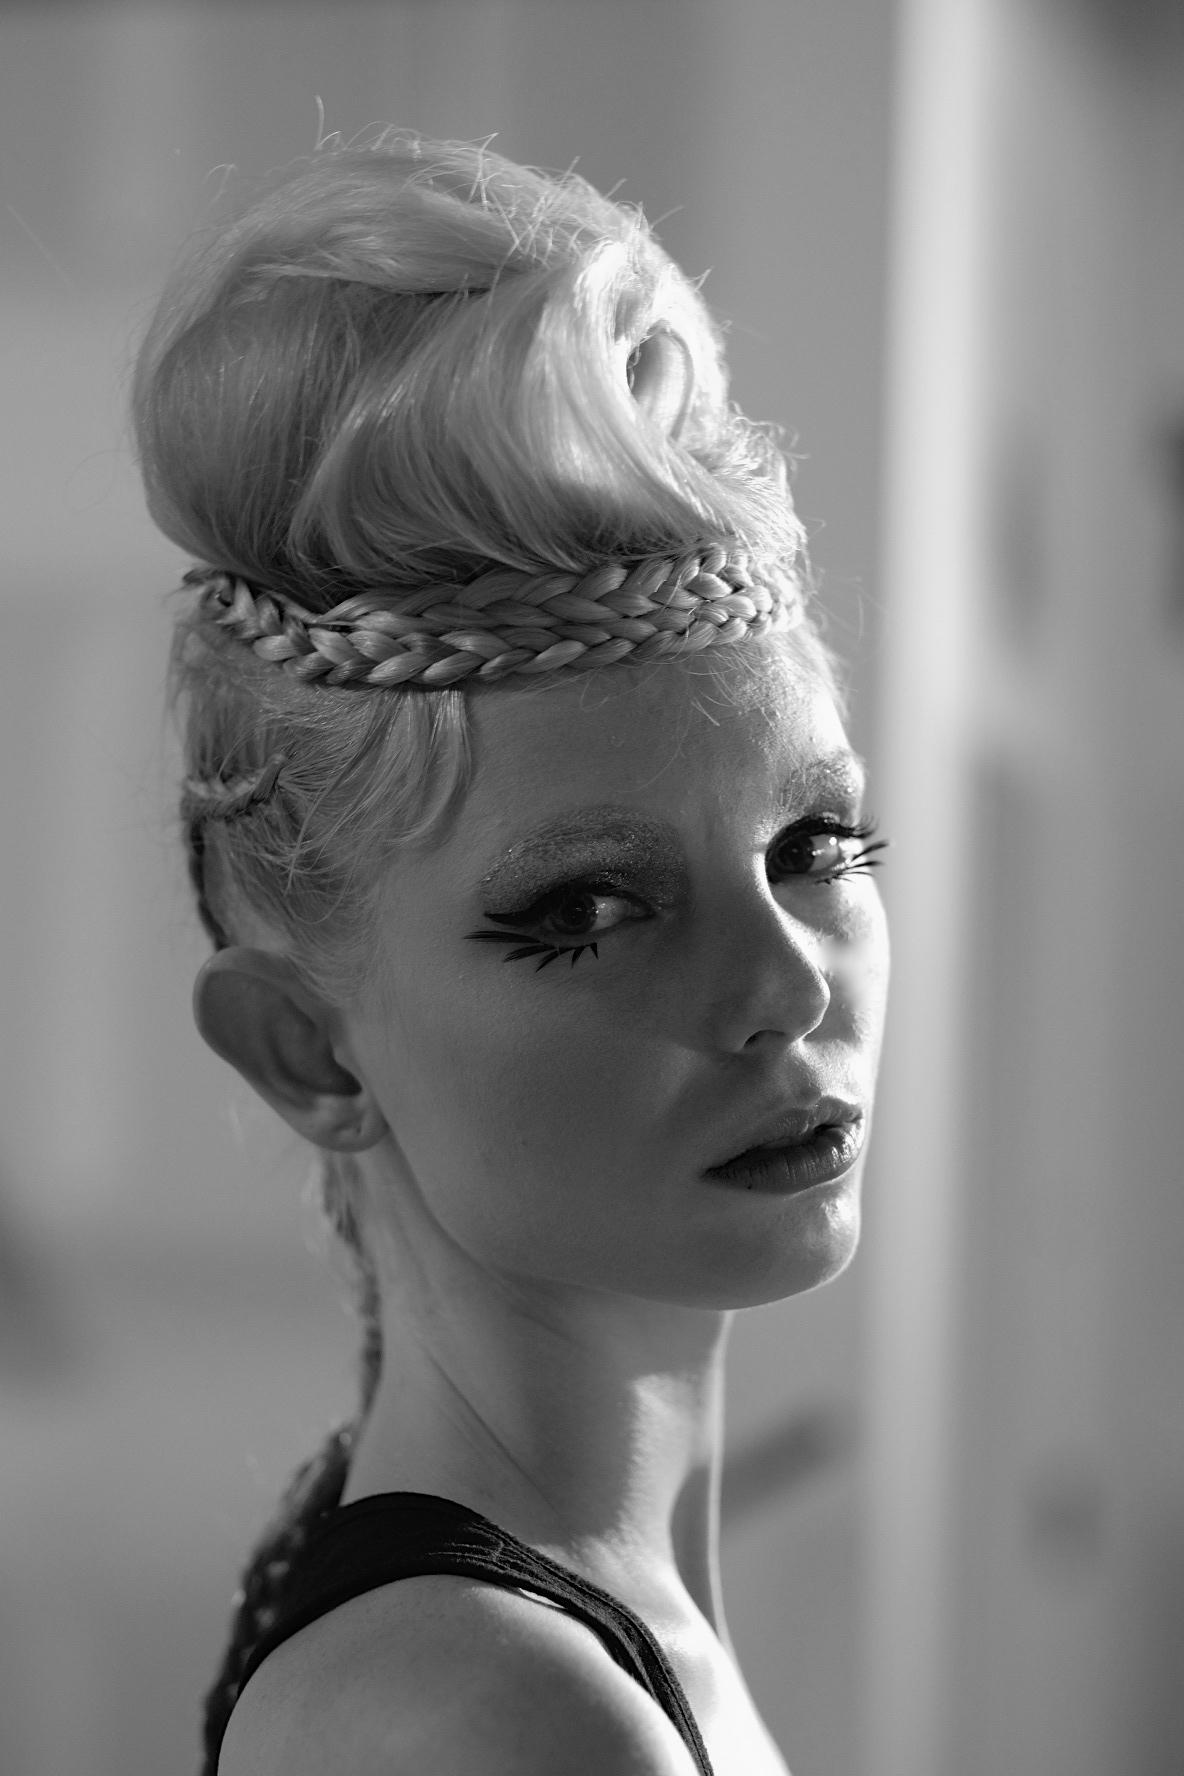 LAFW F/W16 Designer: George Styler Lead Hair: Luxelab Creative Director Lauren Sill Photo: Liz Abrams